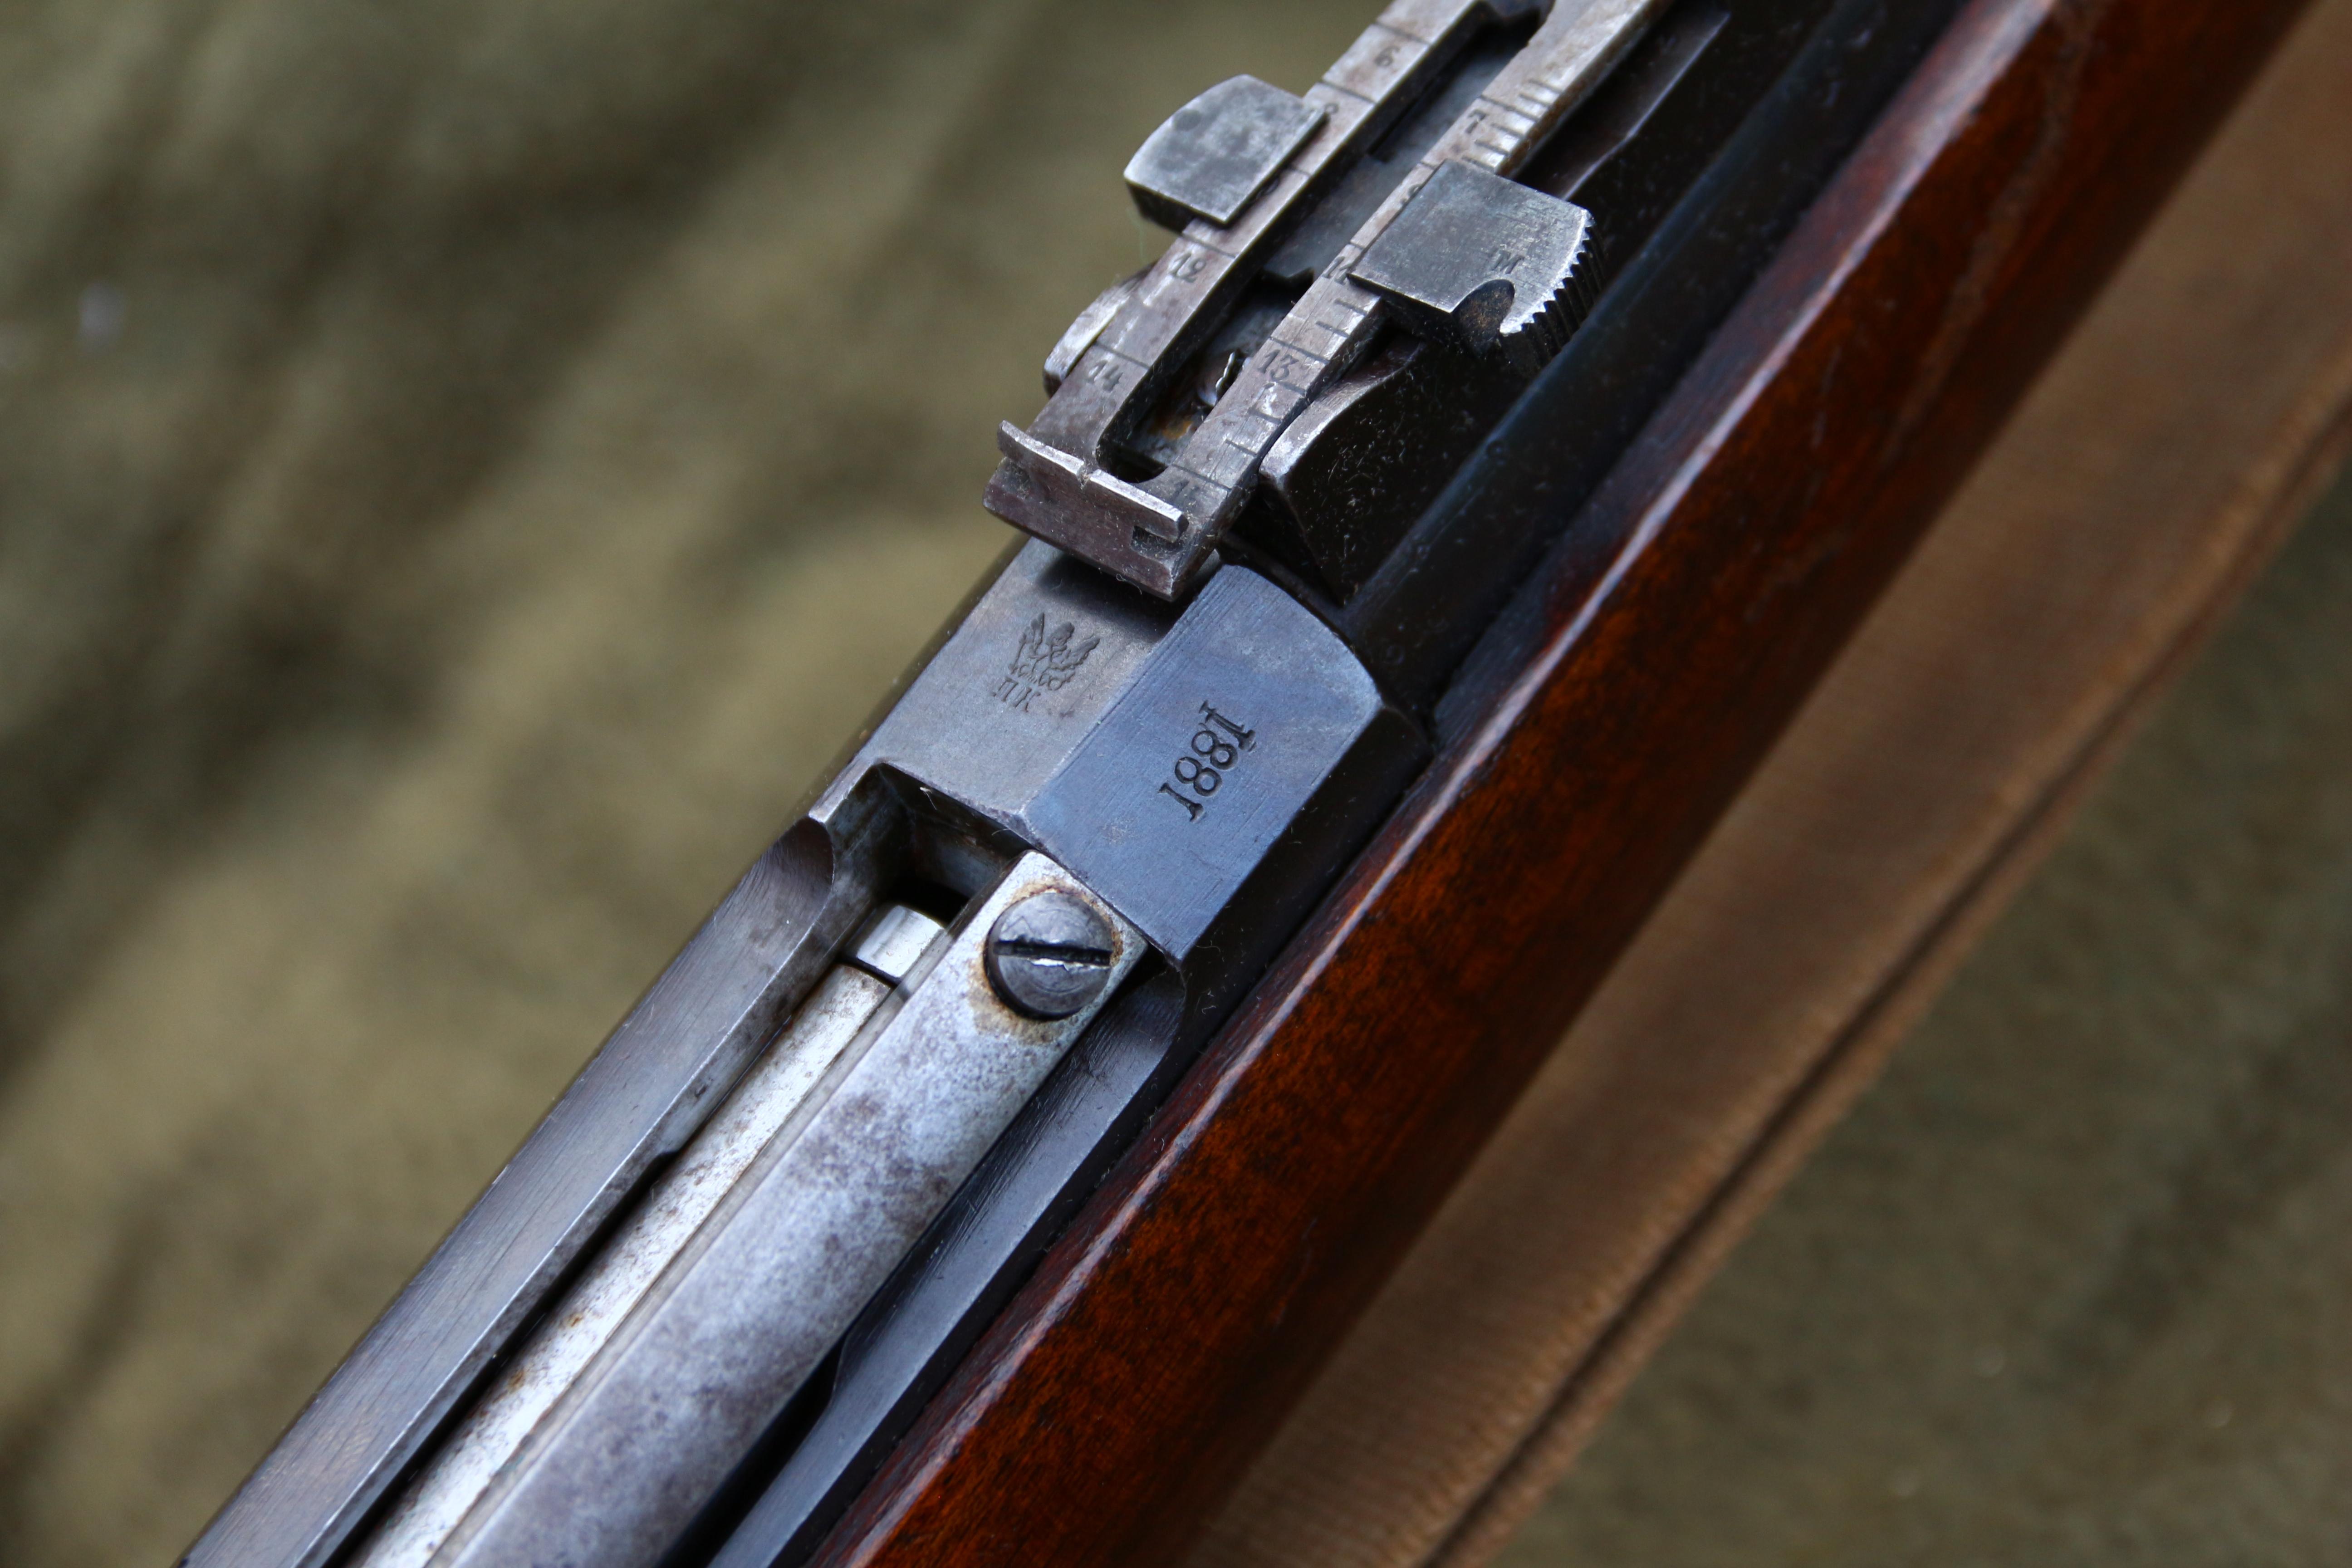 Фото Царская винтовка Бердан 2 №6822 с родным штыком